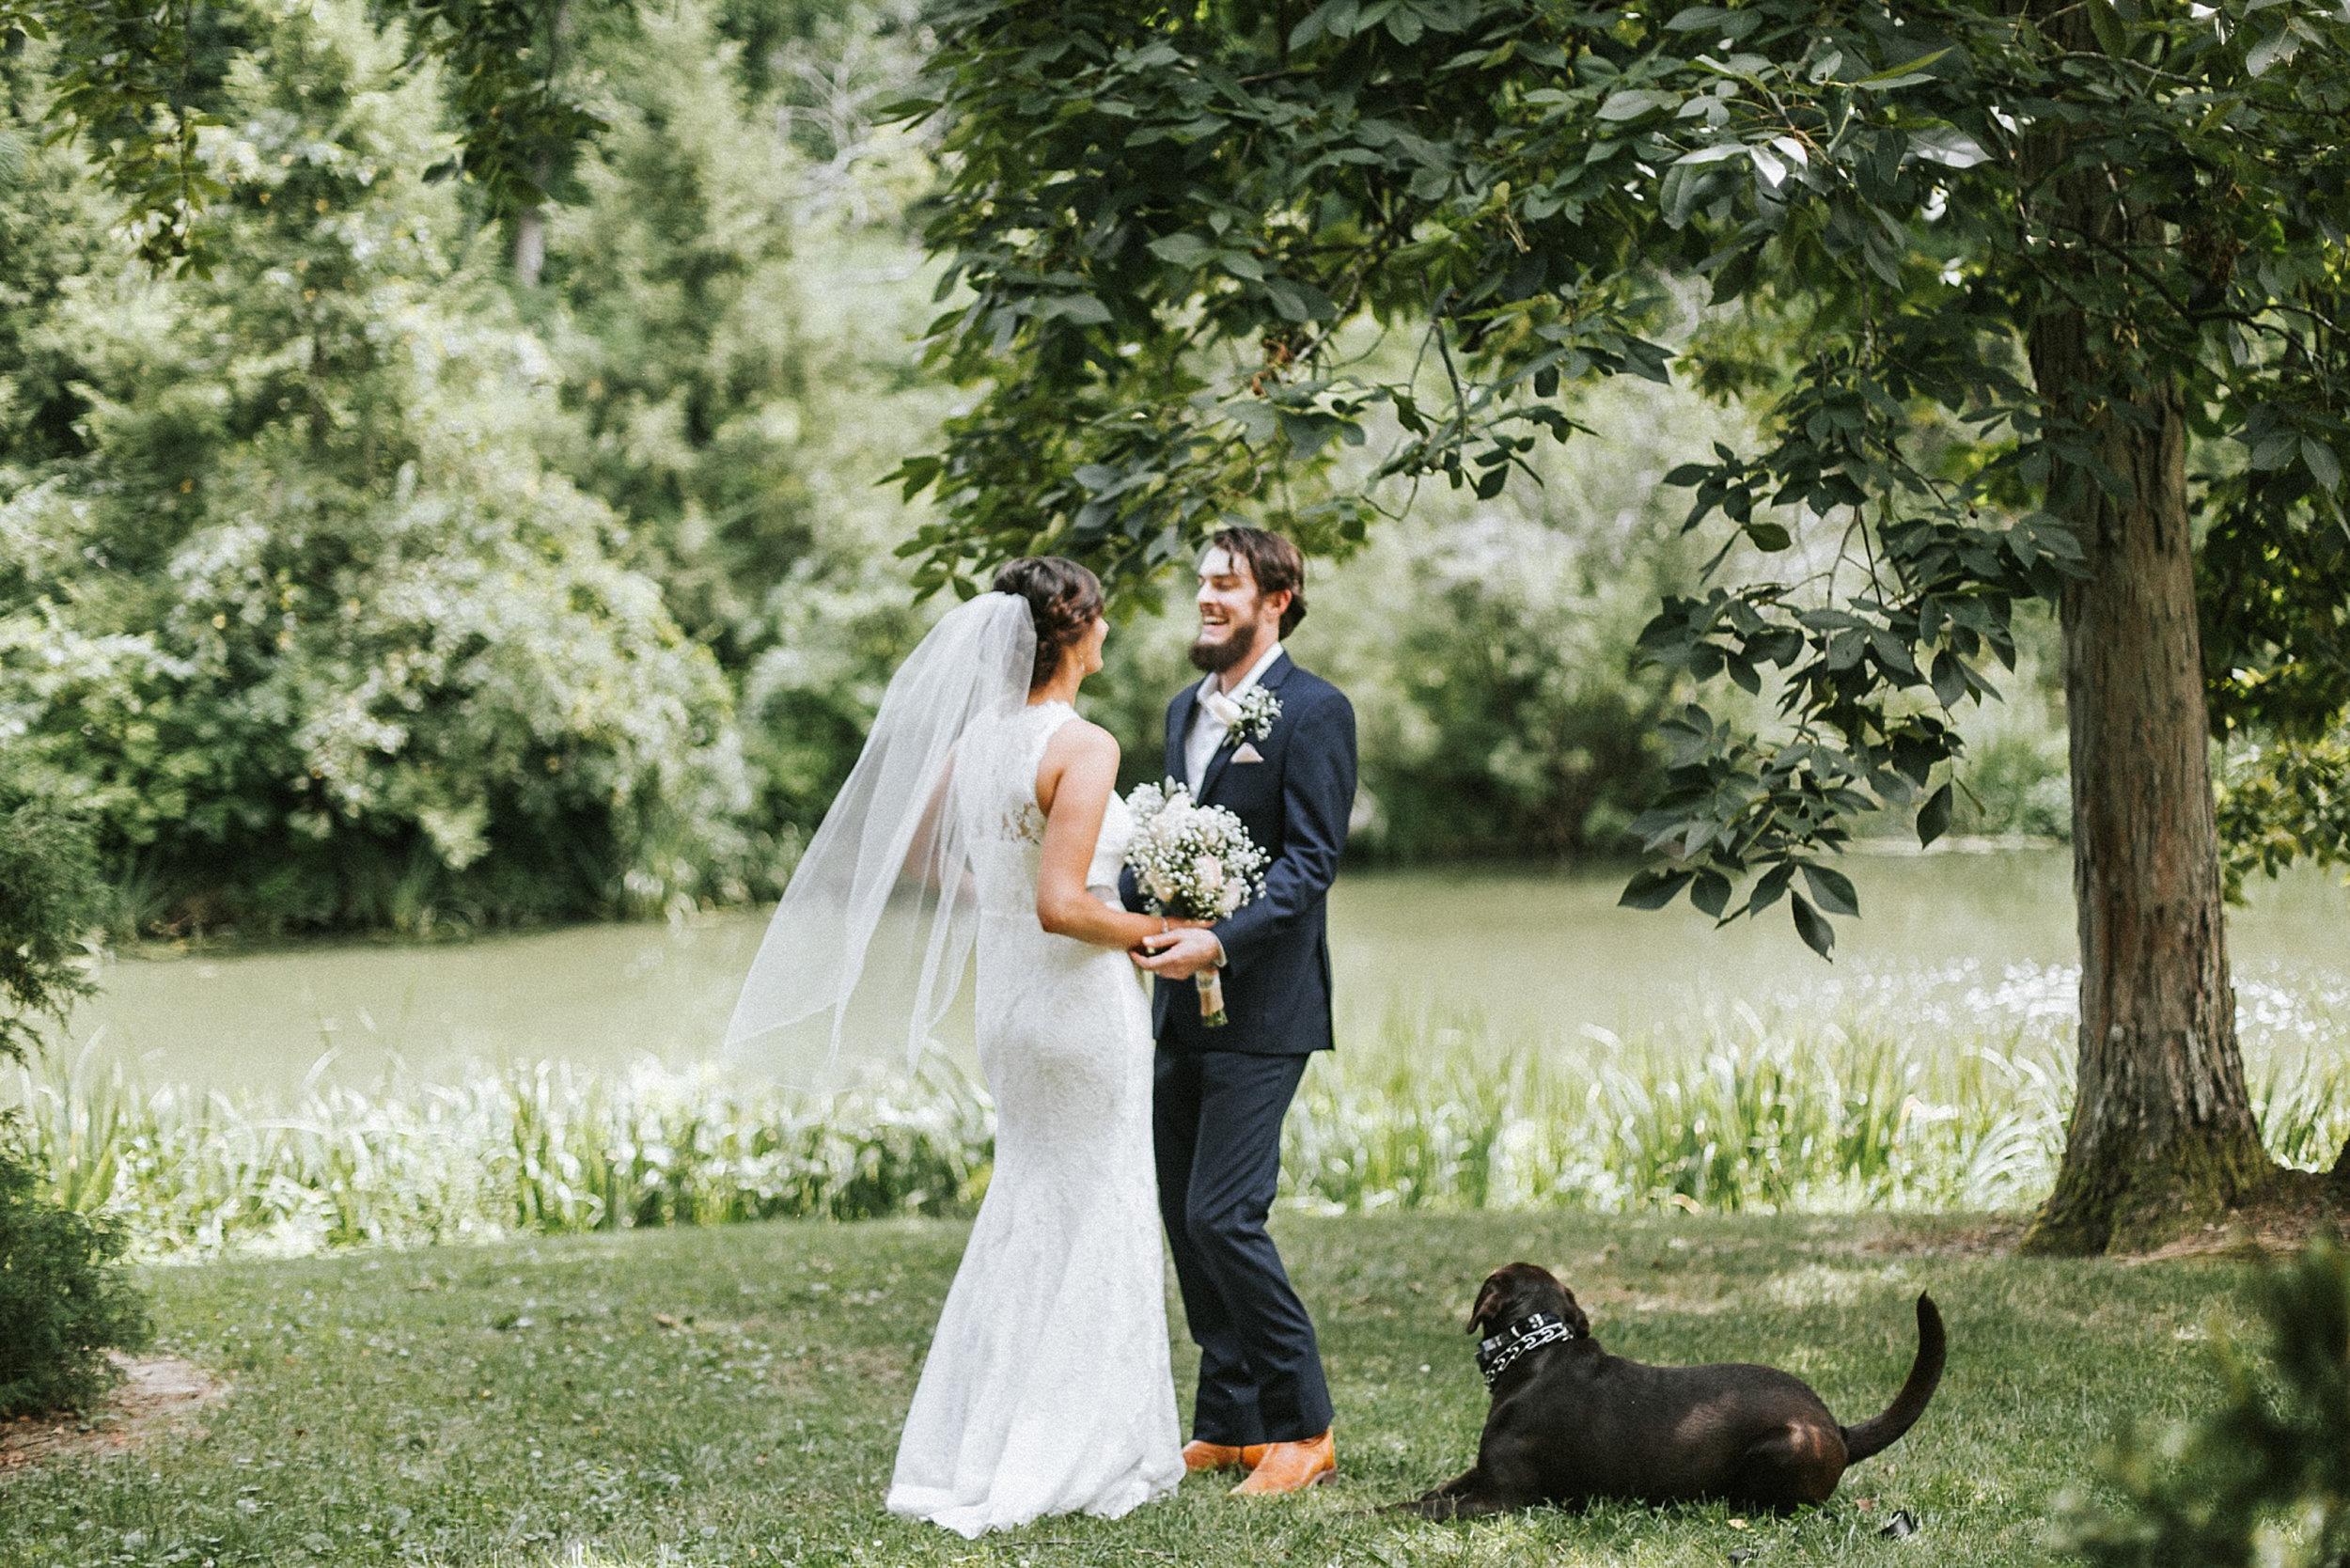 Brooke Townsend Photography - Ohio Wedding Photographer (11 of 78).jpg